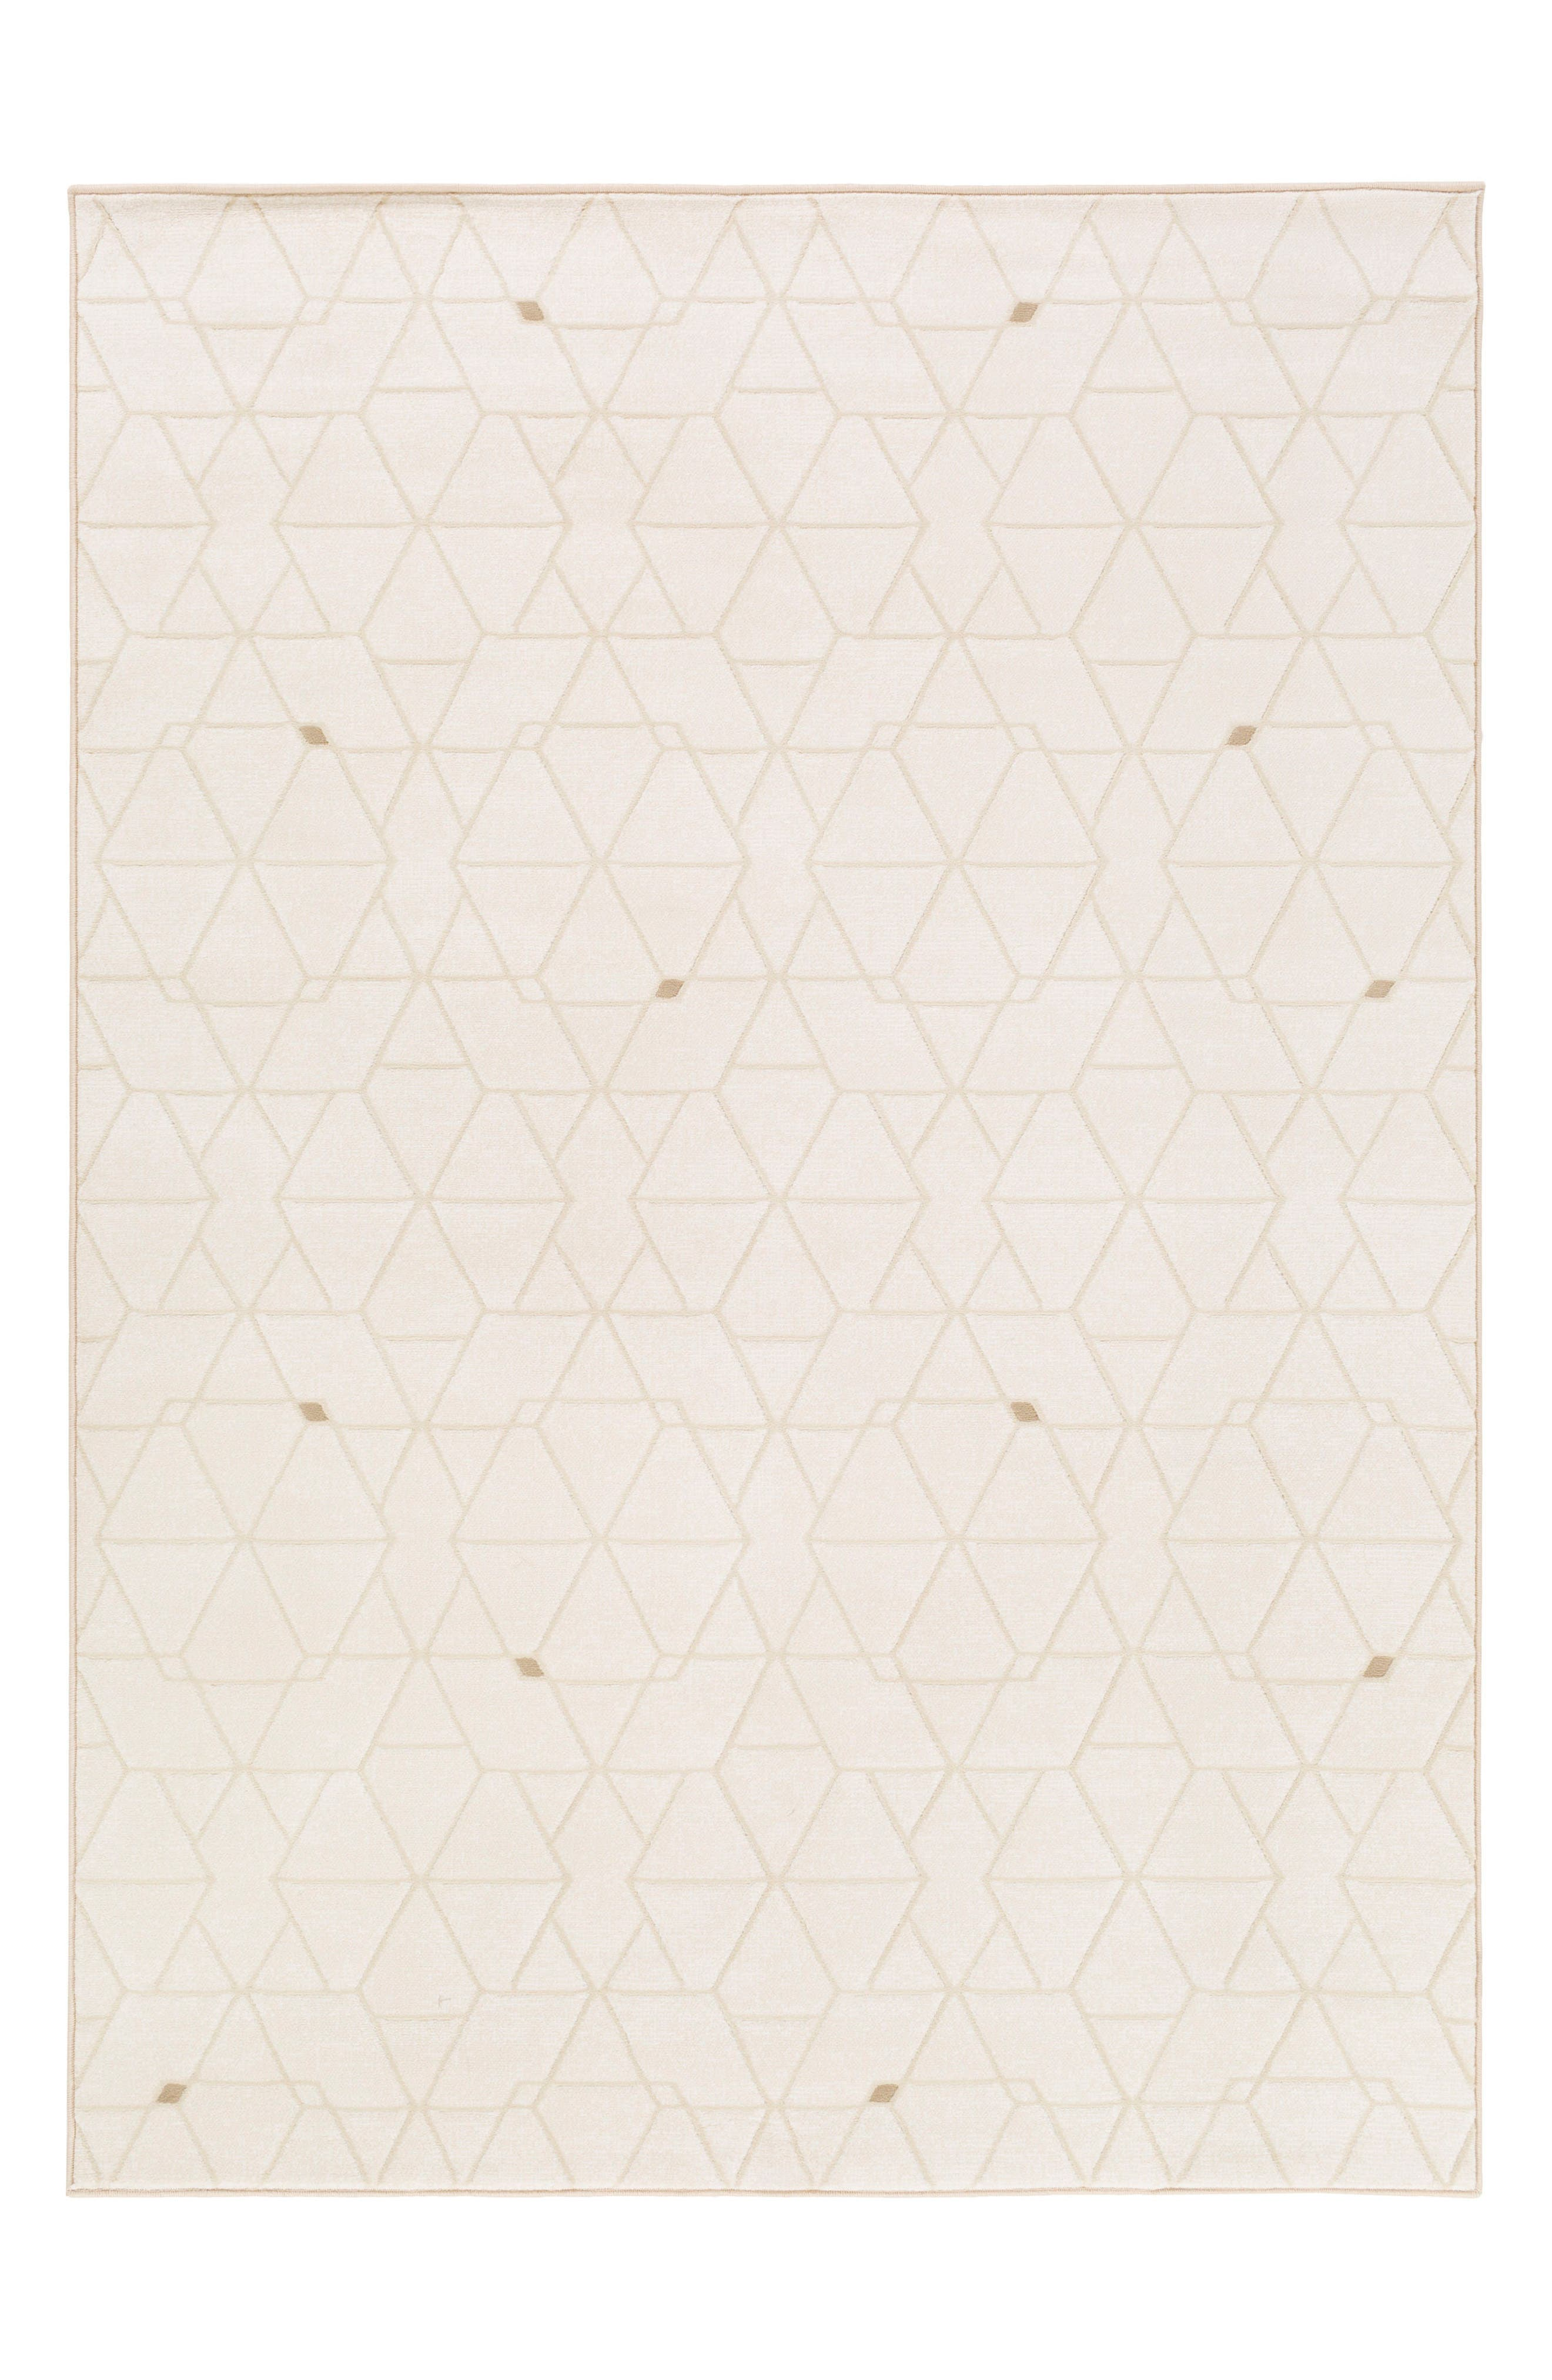 Main Image - Surya Home Geometric Rug